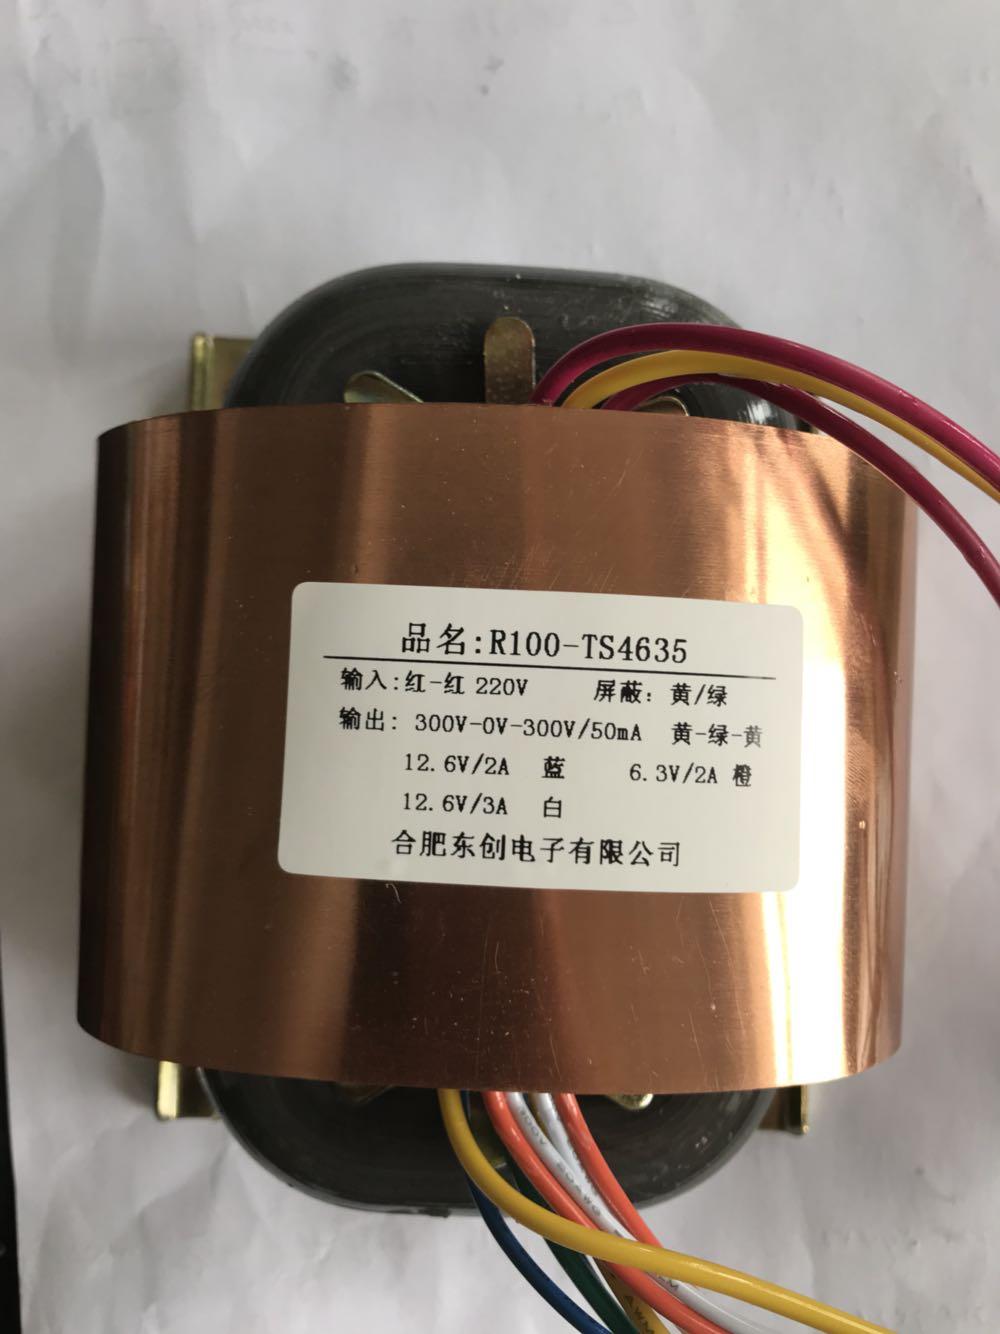 300v-0-300v 50ma 12.6 v 3a 12.6 v 2a 6.3 v 2a r núcleo transformador 100va r100 transformador personalizado 220 v cobre escudo amplificador de potência